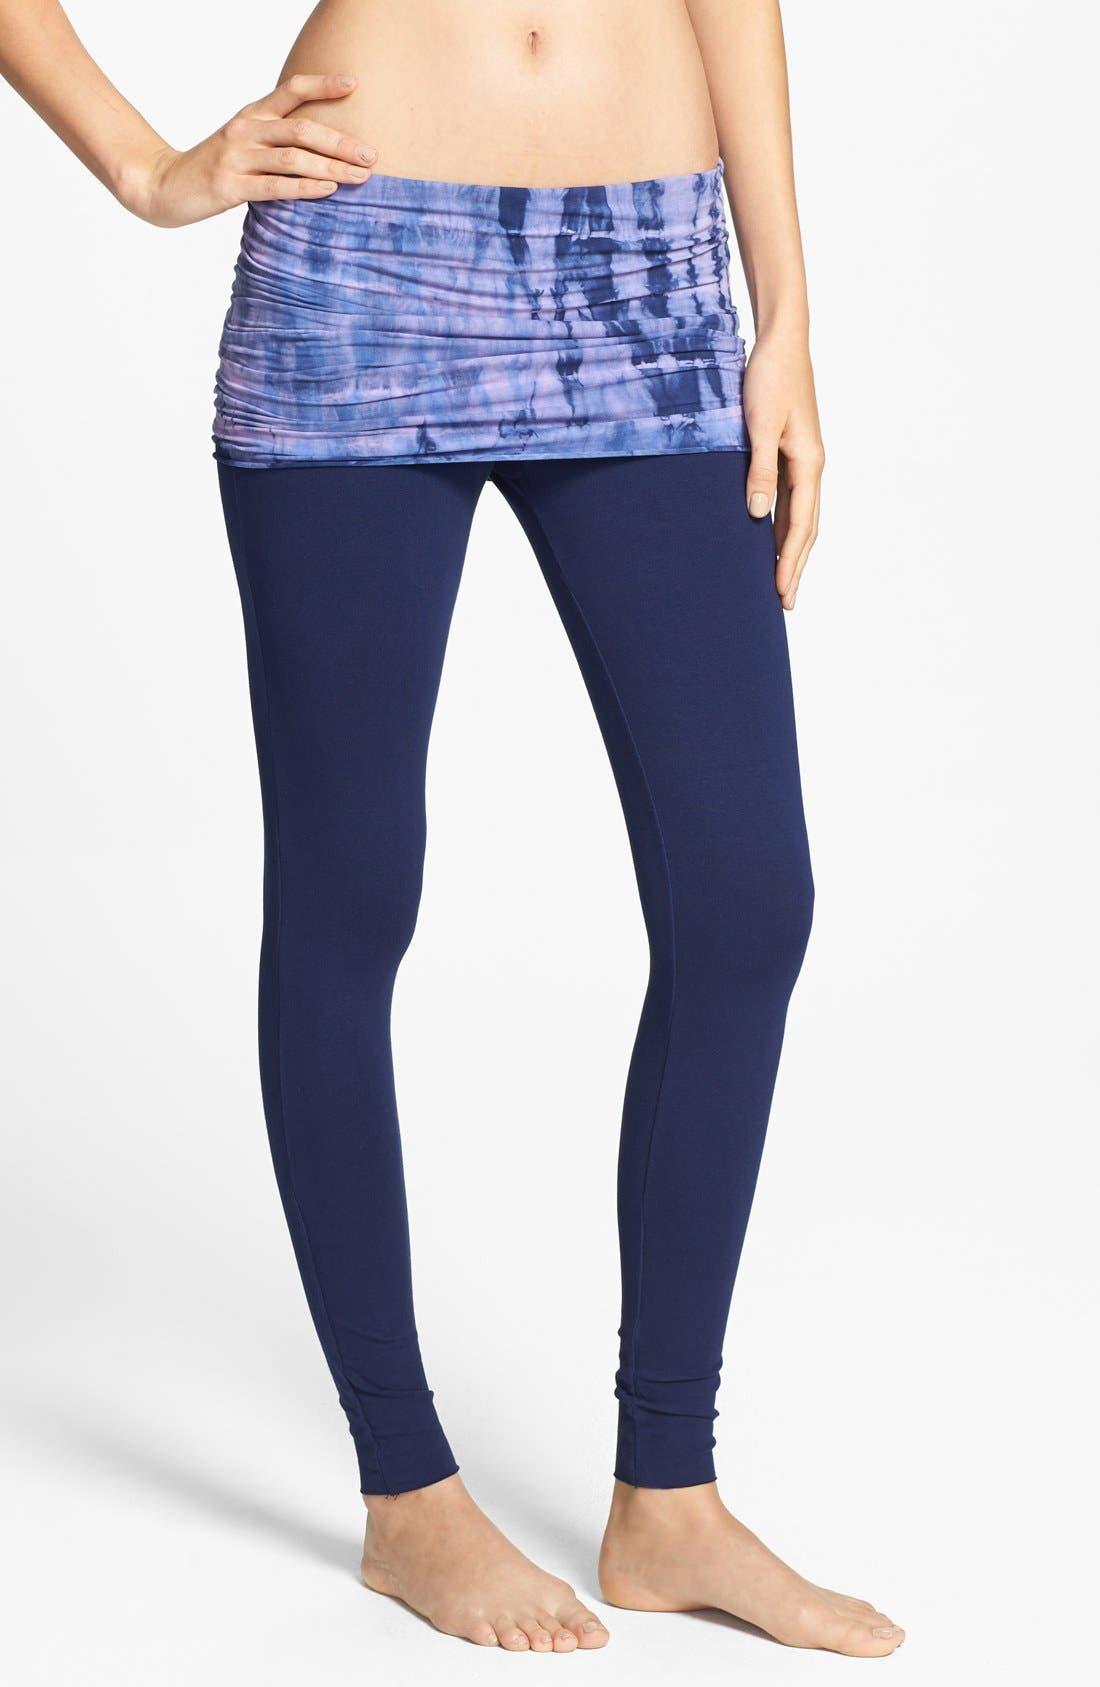 Alternate Image 1 Selected - Omgirl 'Nomad - Mad Plaid' Organic Cotton Foldover Leggings